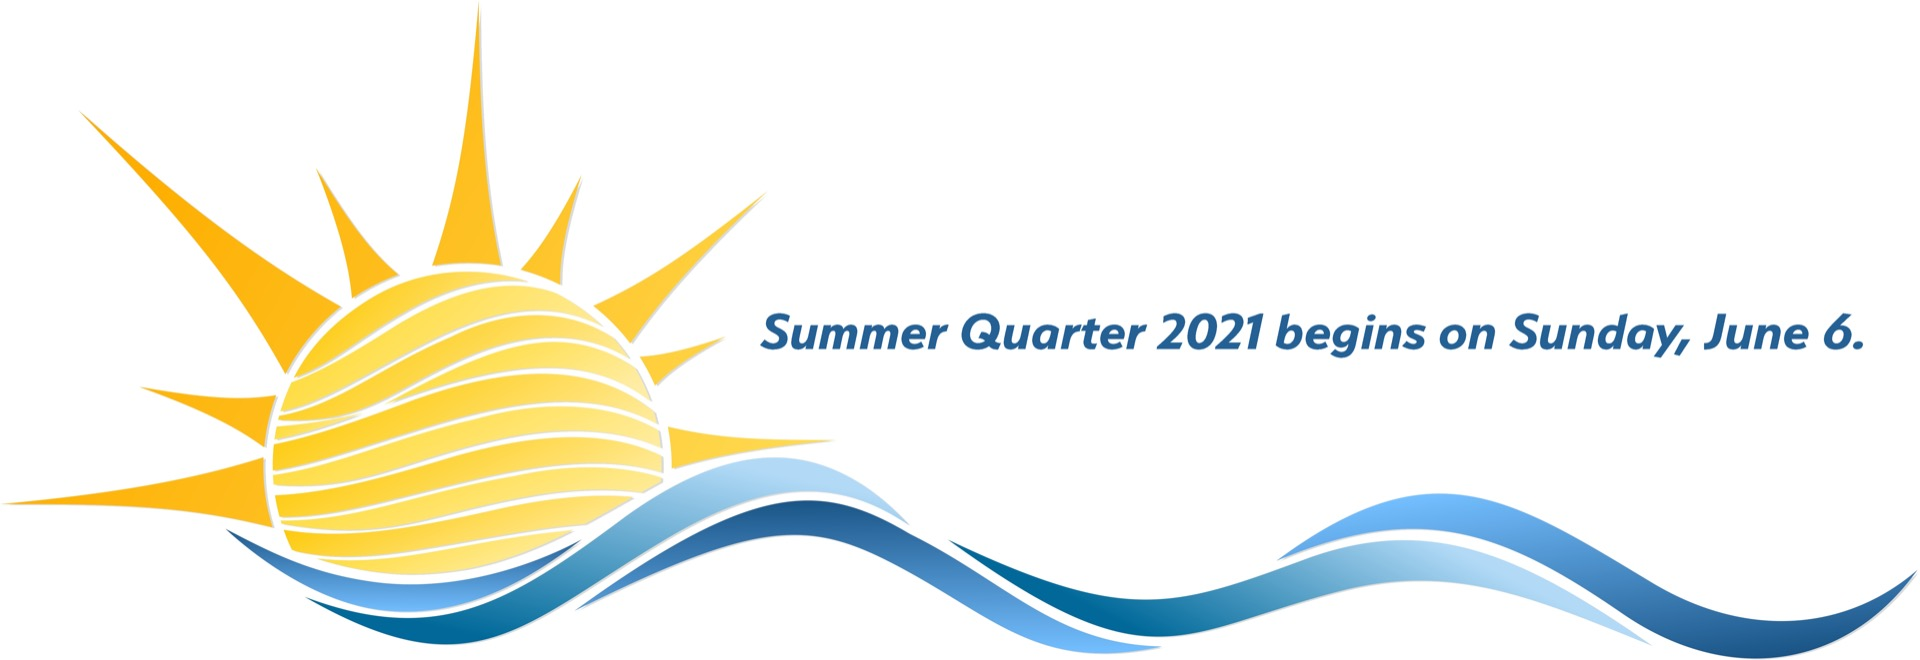 Summer 2021 Begins June 6